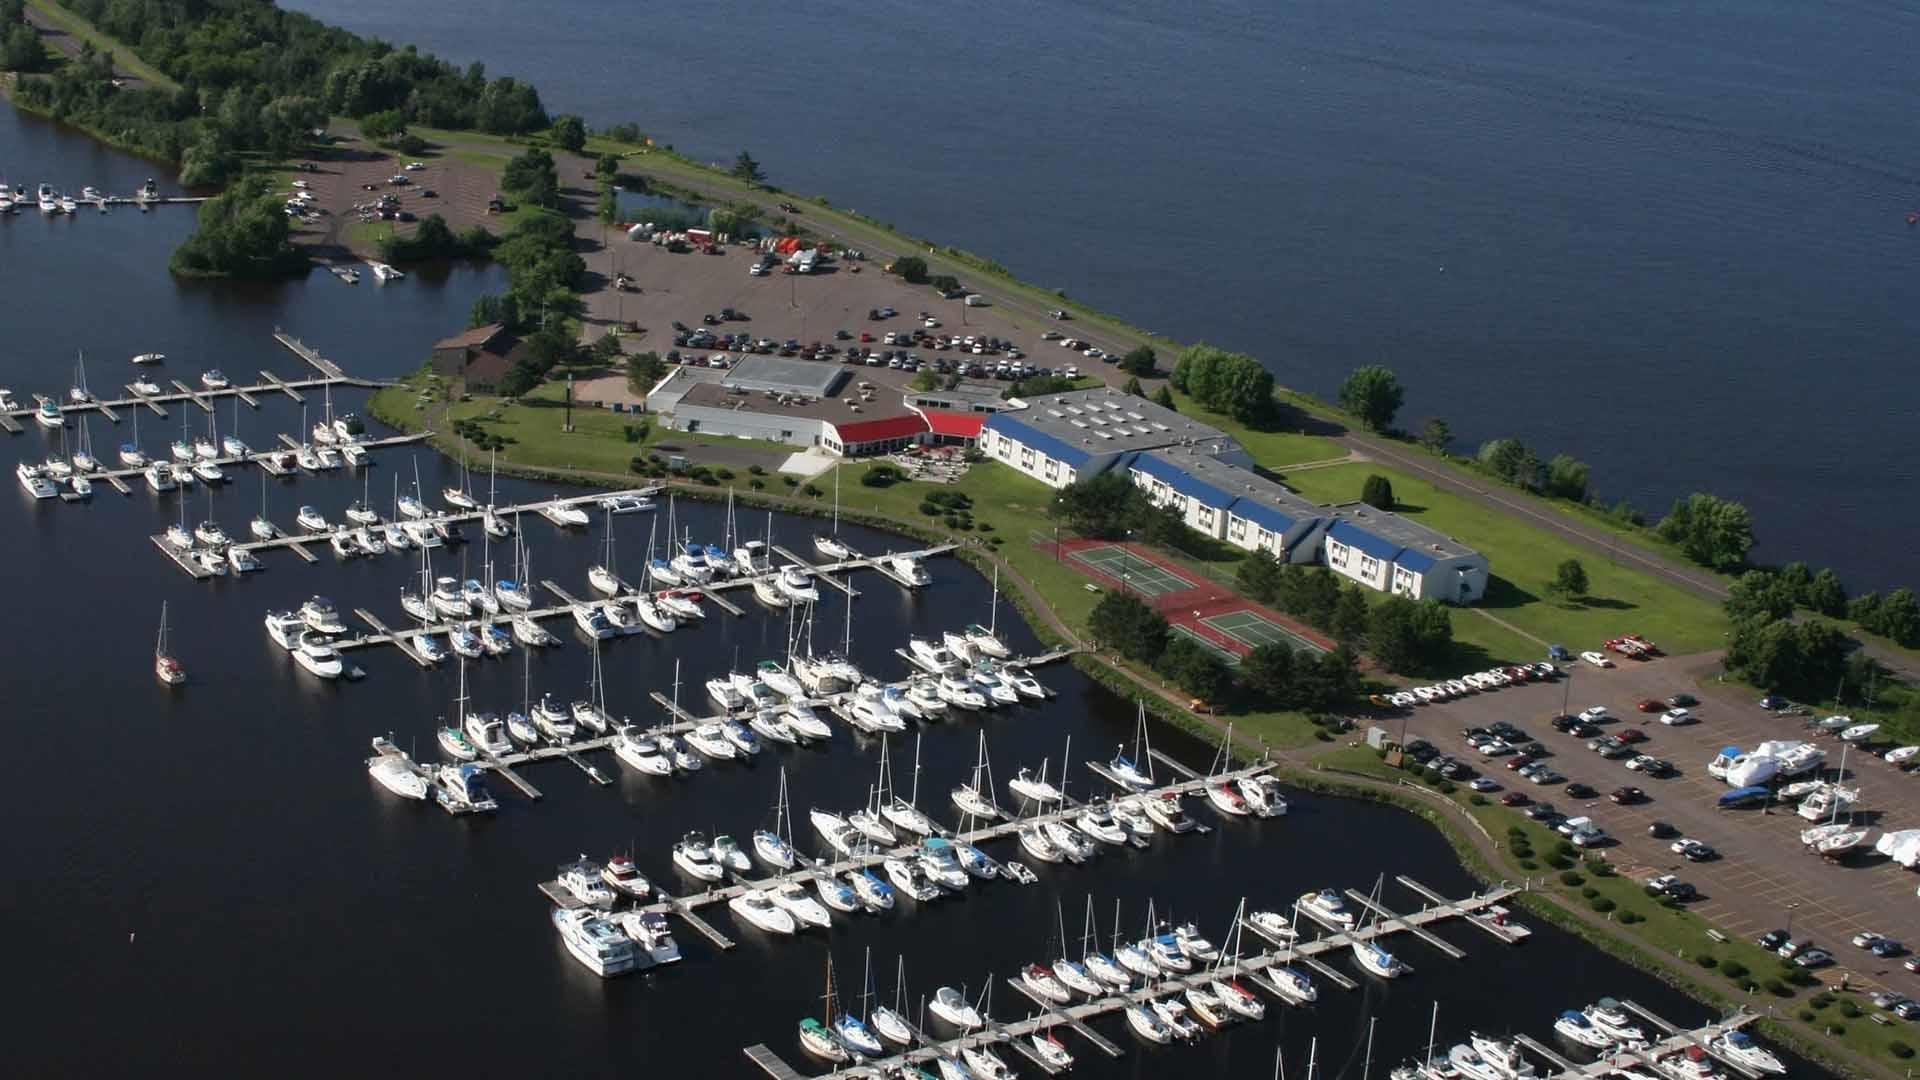 Barkers Island Inn Resort & Conference Center image 0